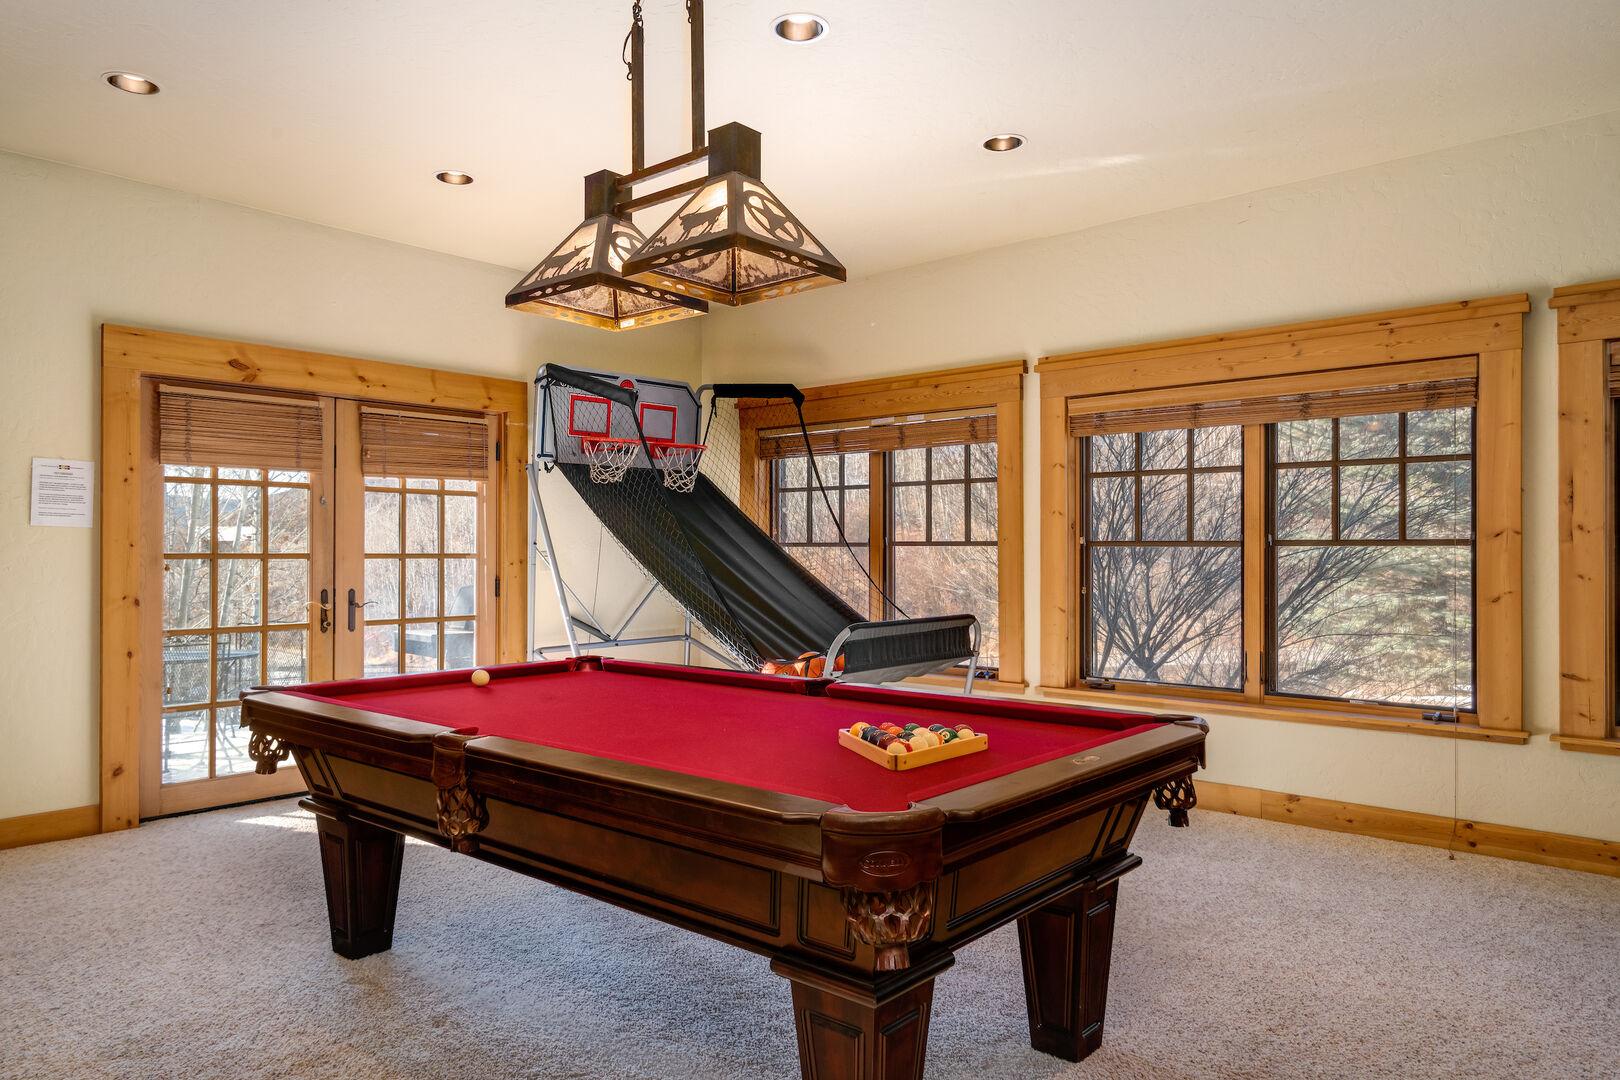 Pool table and basketball hoops!